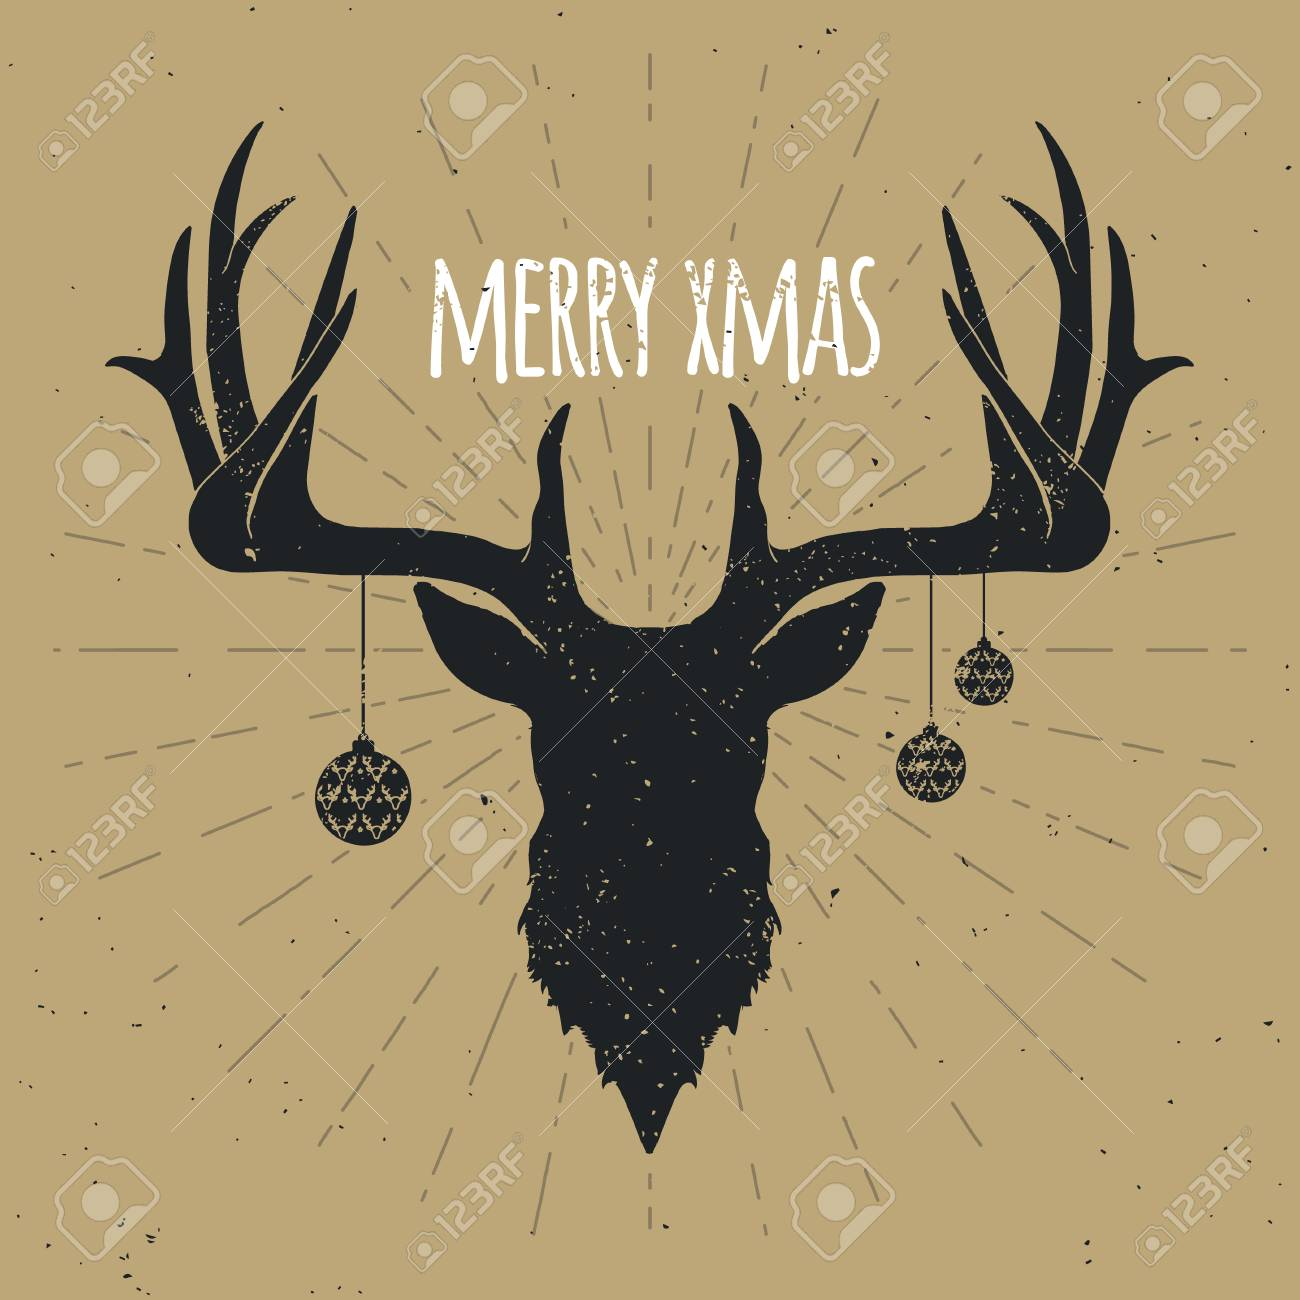 Retro Vintage Christmas Deer, Black Silhouette on Gold background.